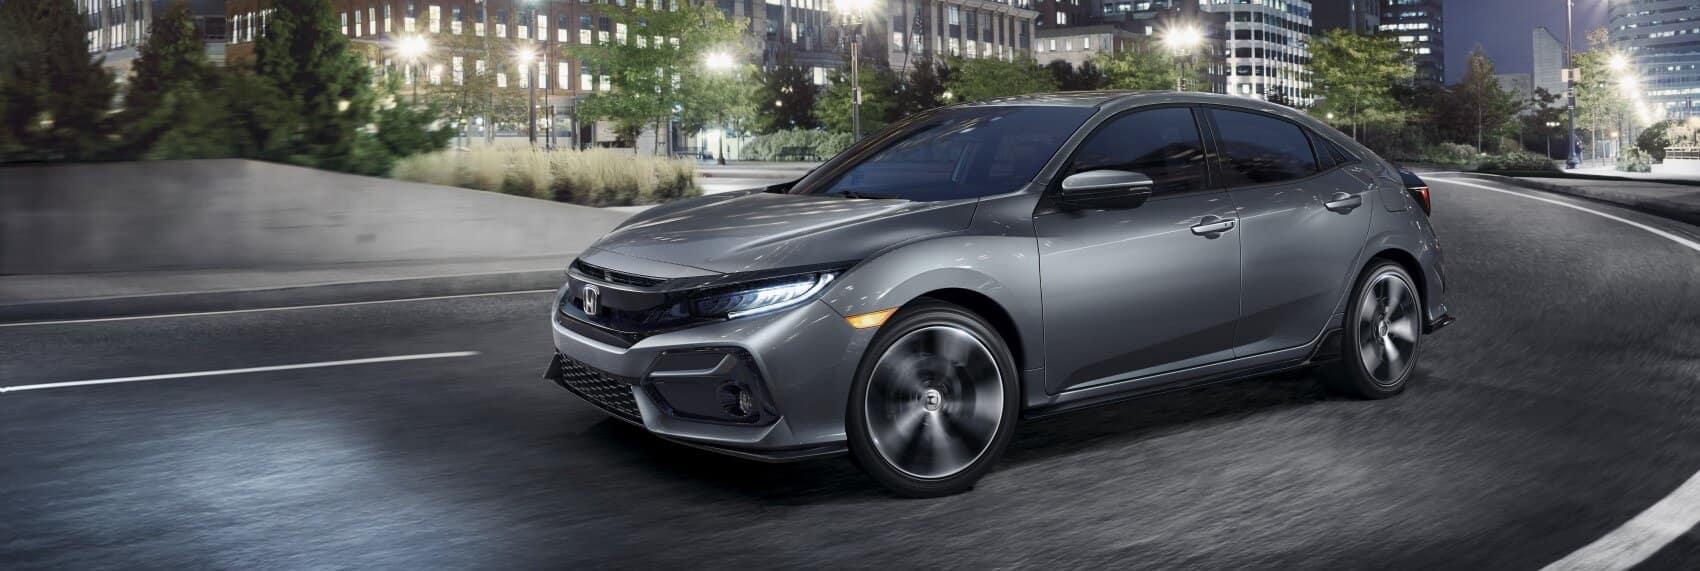 2021 Honda Civic Technology Review